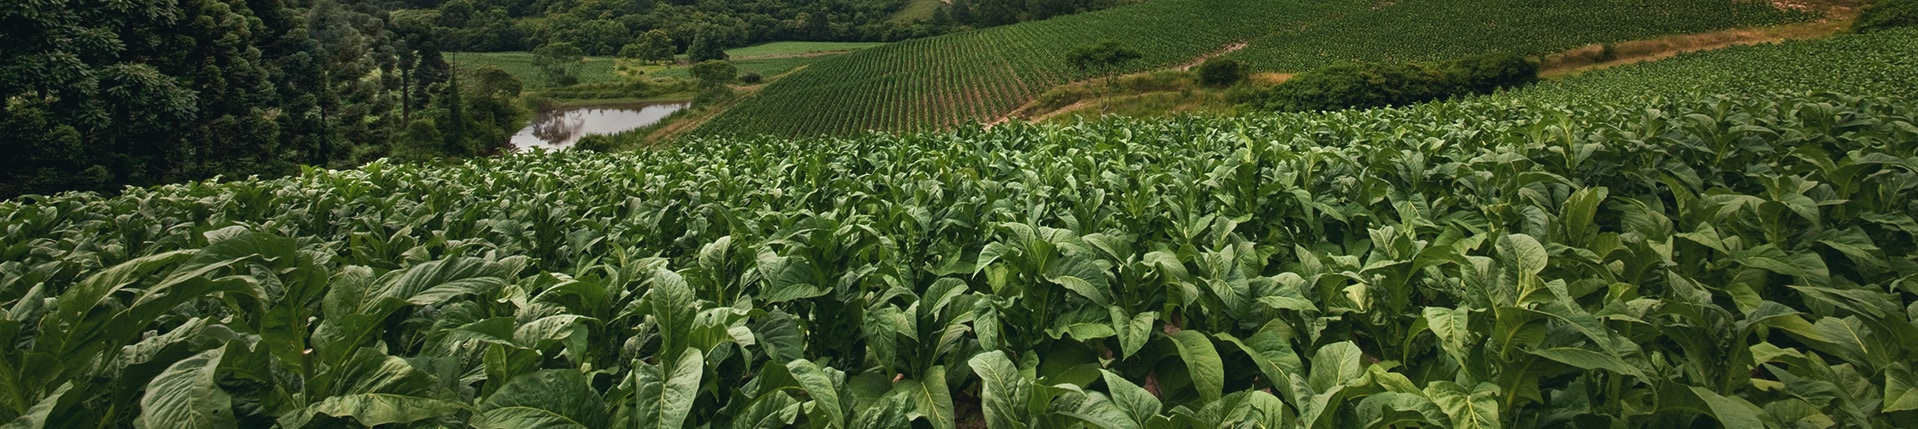 banner tobacco farming